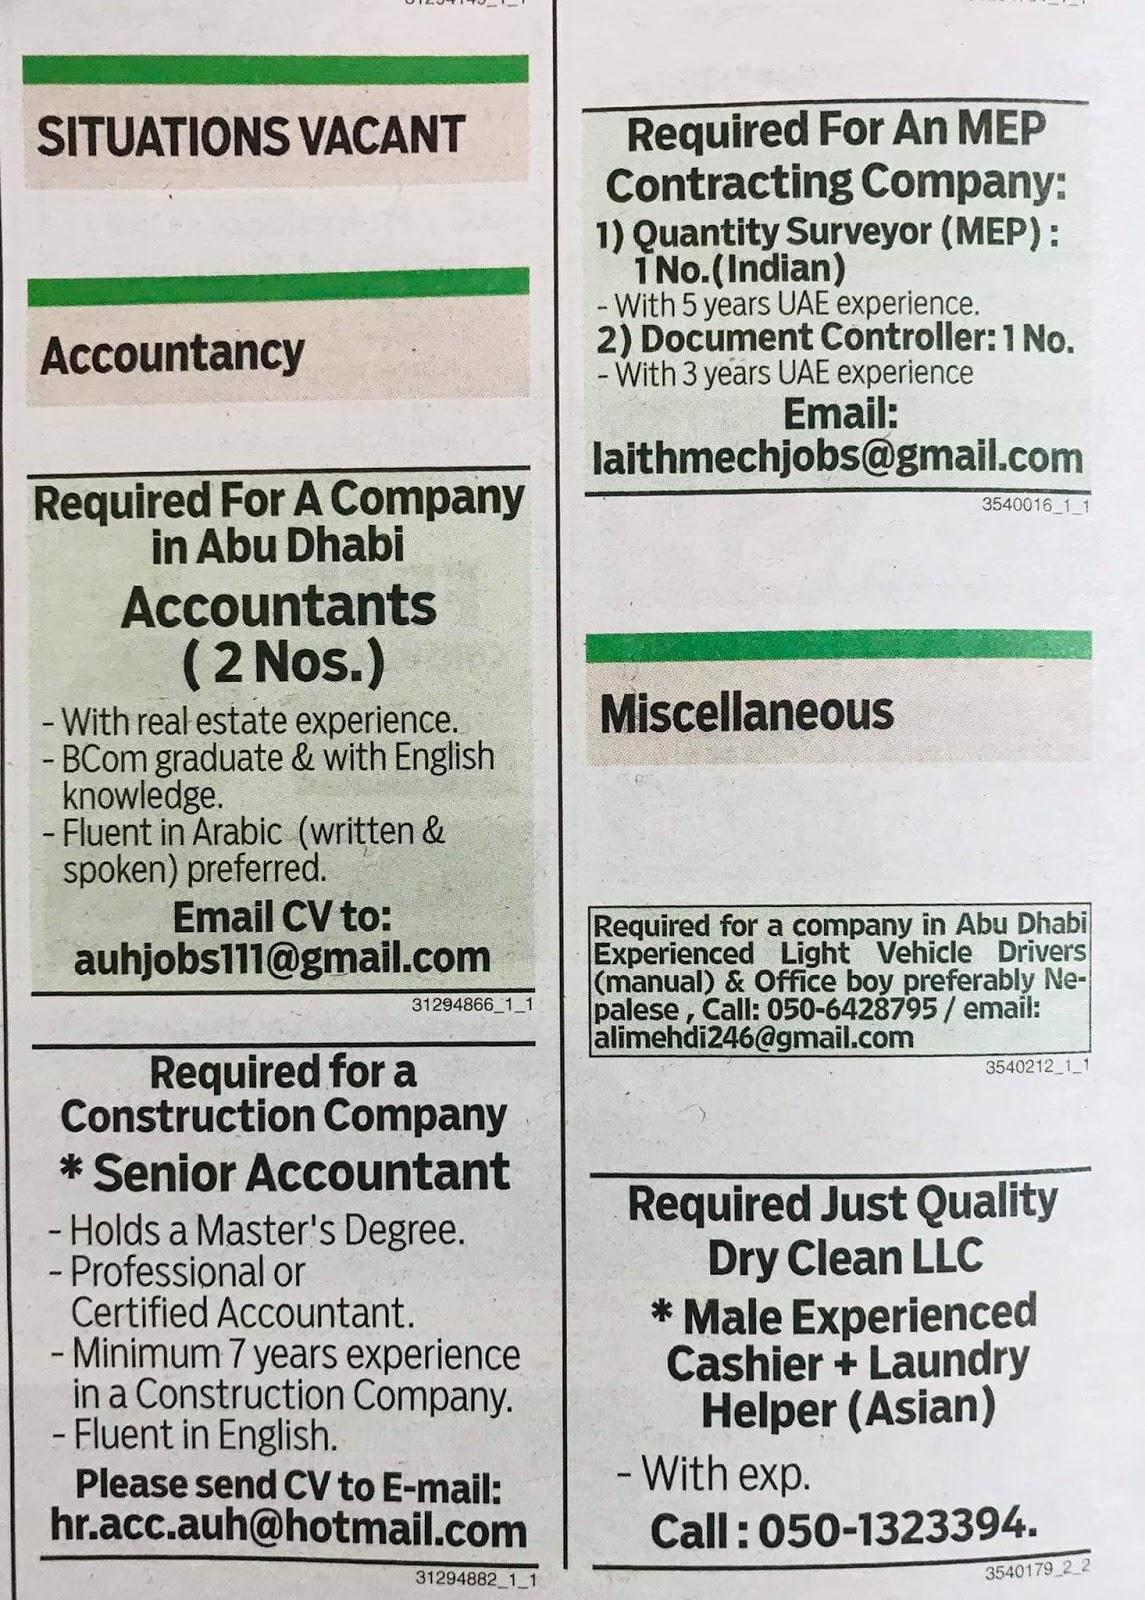 gulf news jobs ads 20/11/2018 - وظائف شاغرة فى الامارات